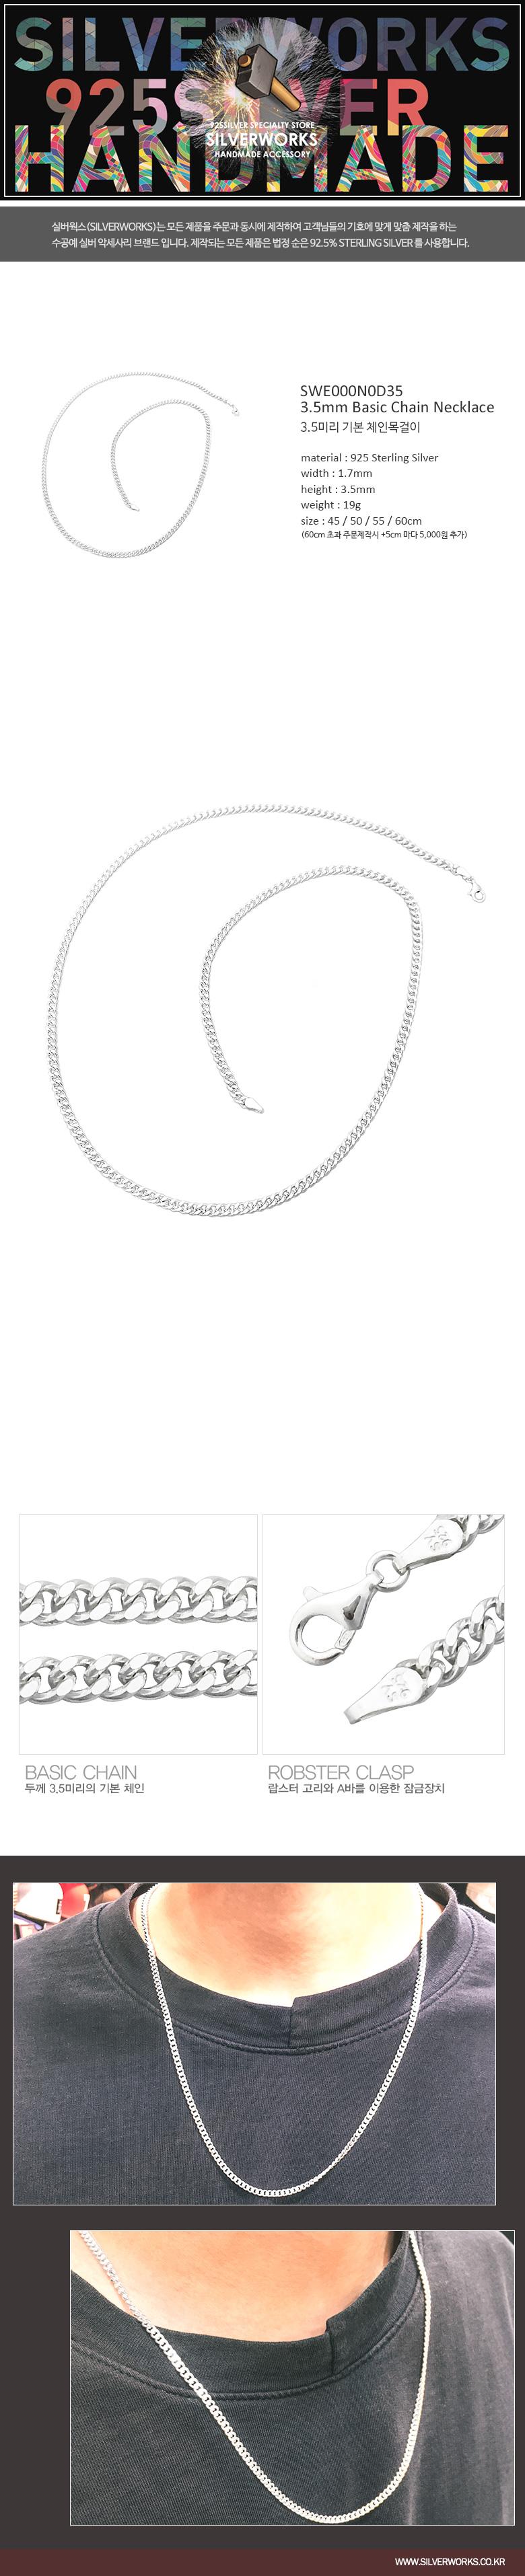 3.5mm 체인 은목걸이 SWE000N0D35 - 실버웍스, 60,000원, 남성주얼리, 목걸이